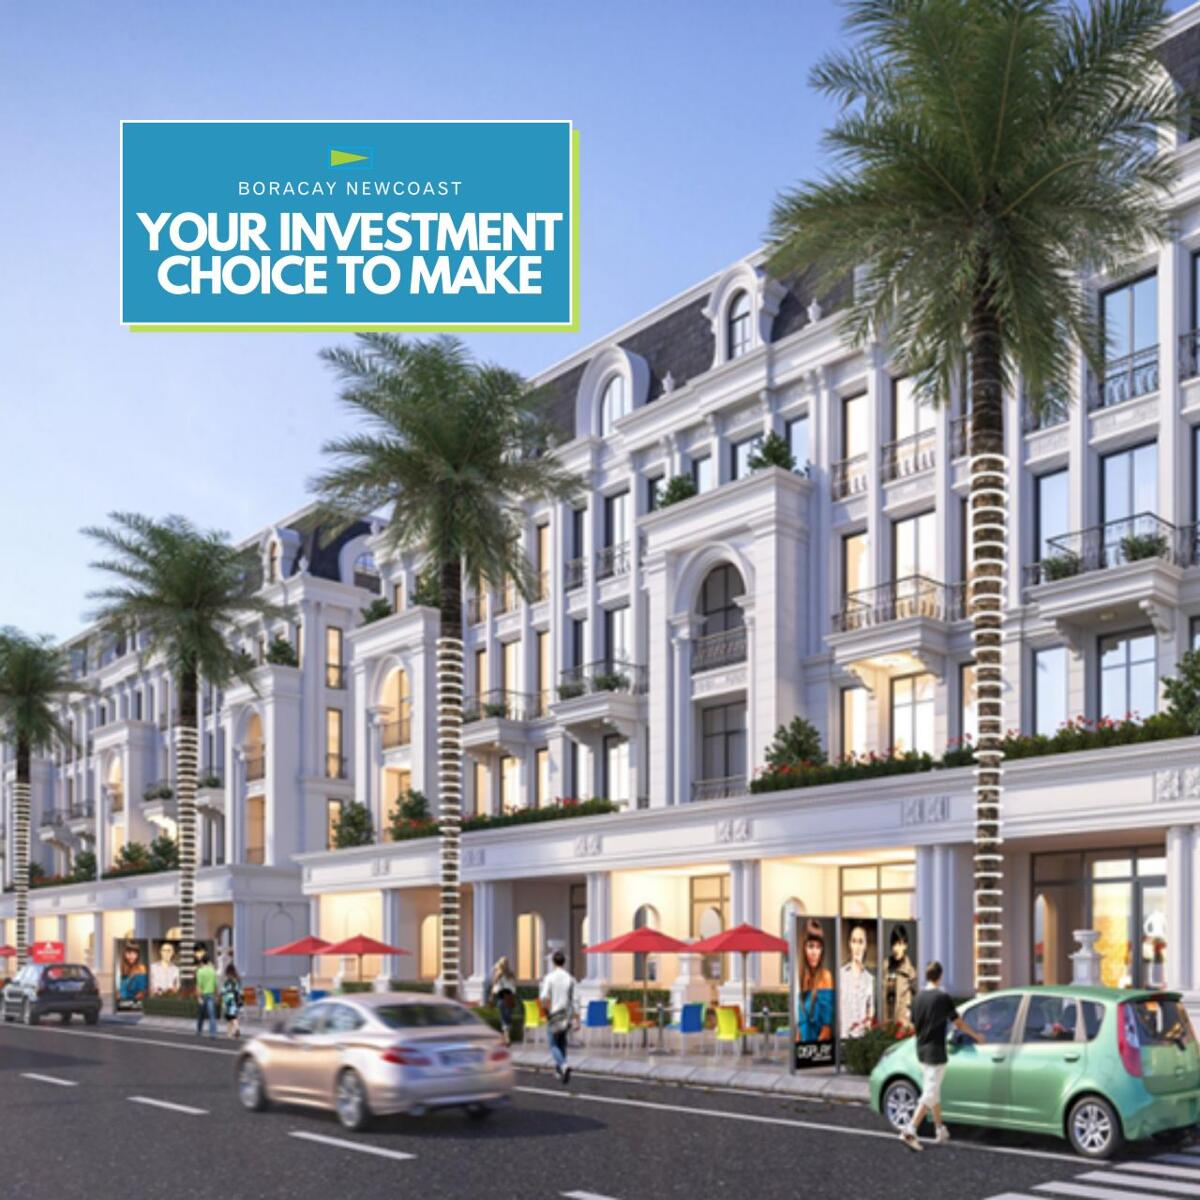 Boracay Newcoast Boutique Hotel Plan 2